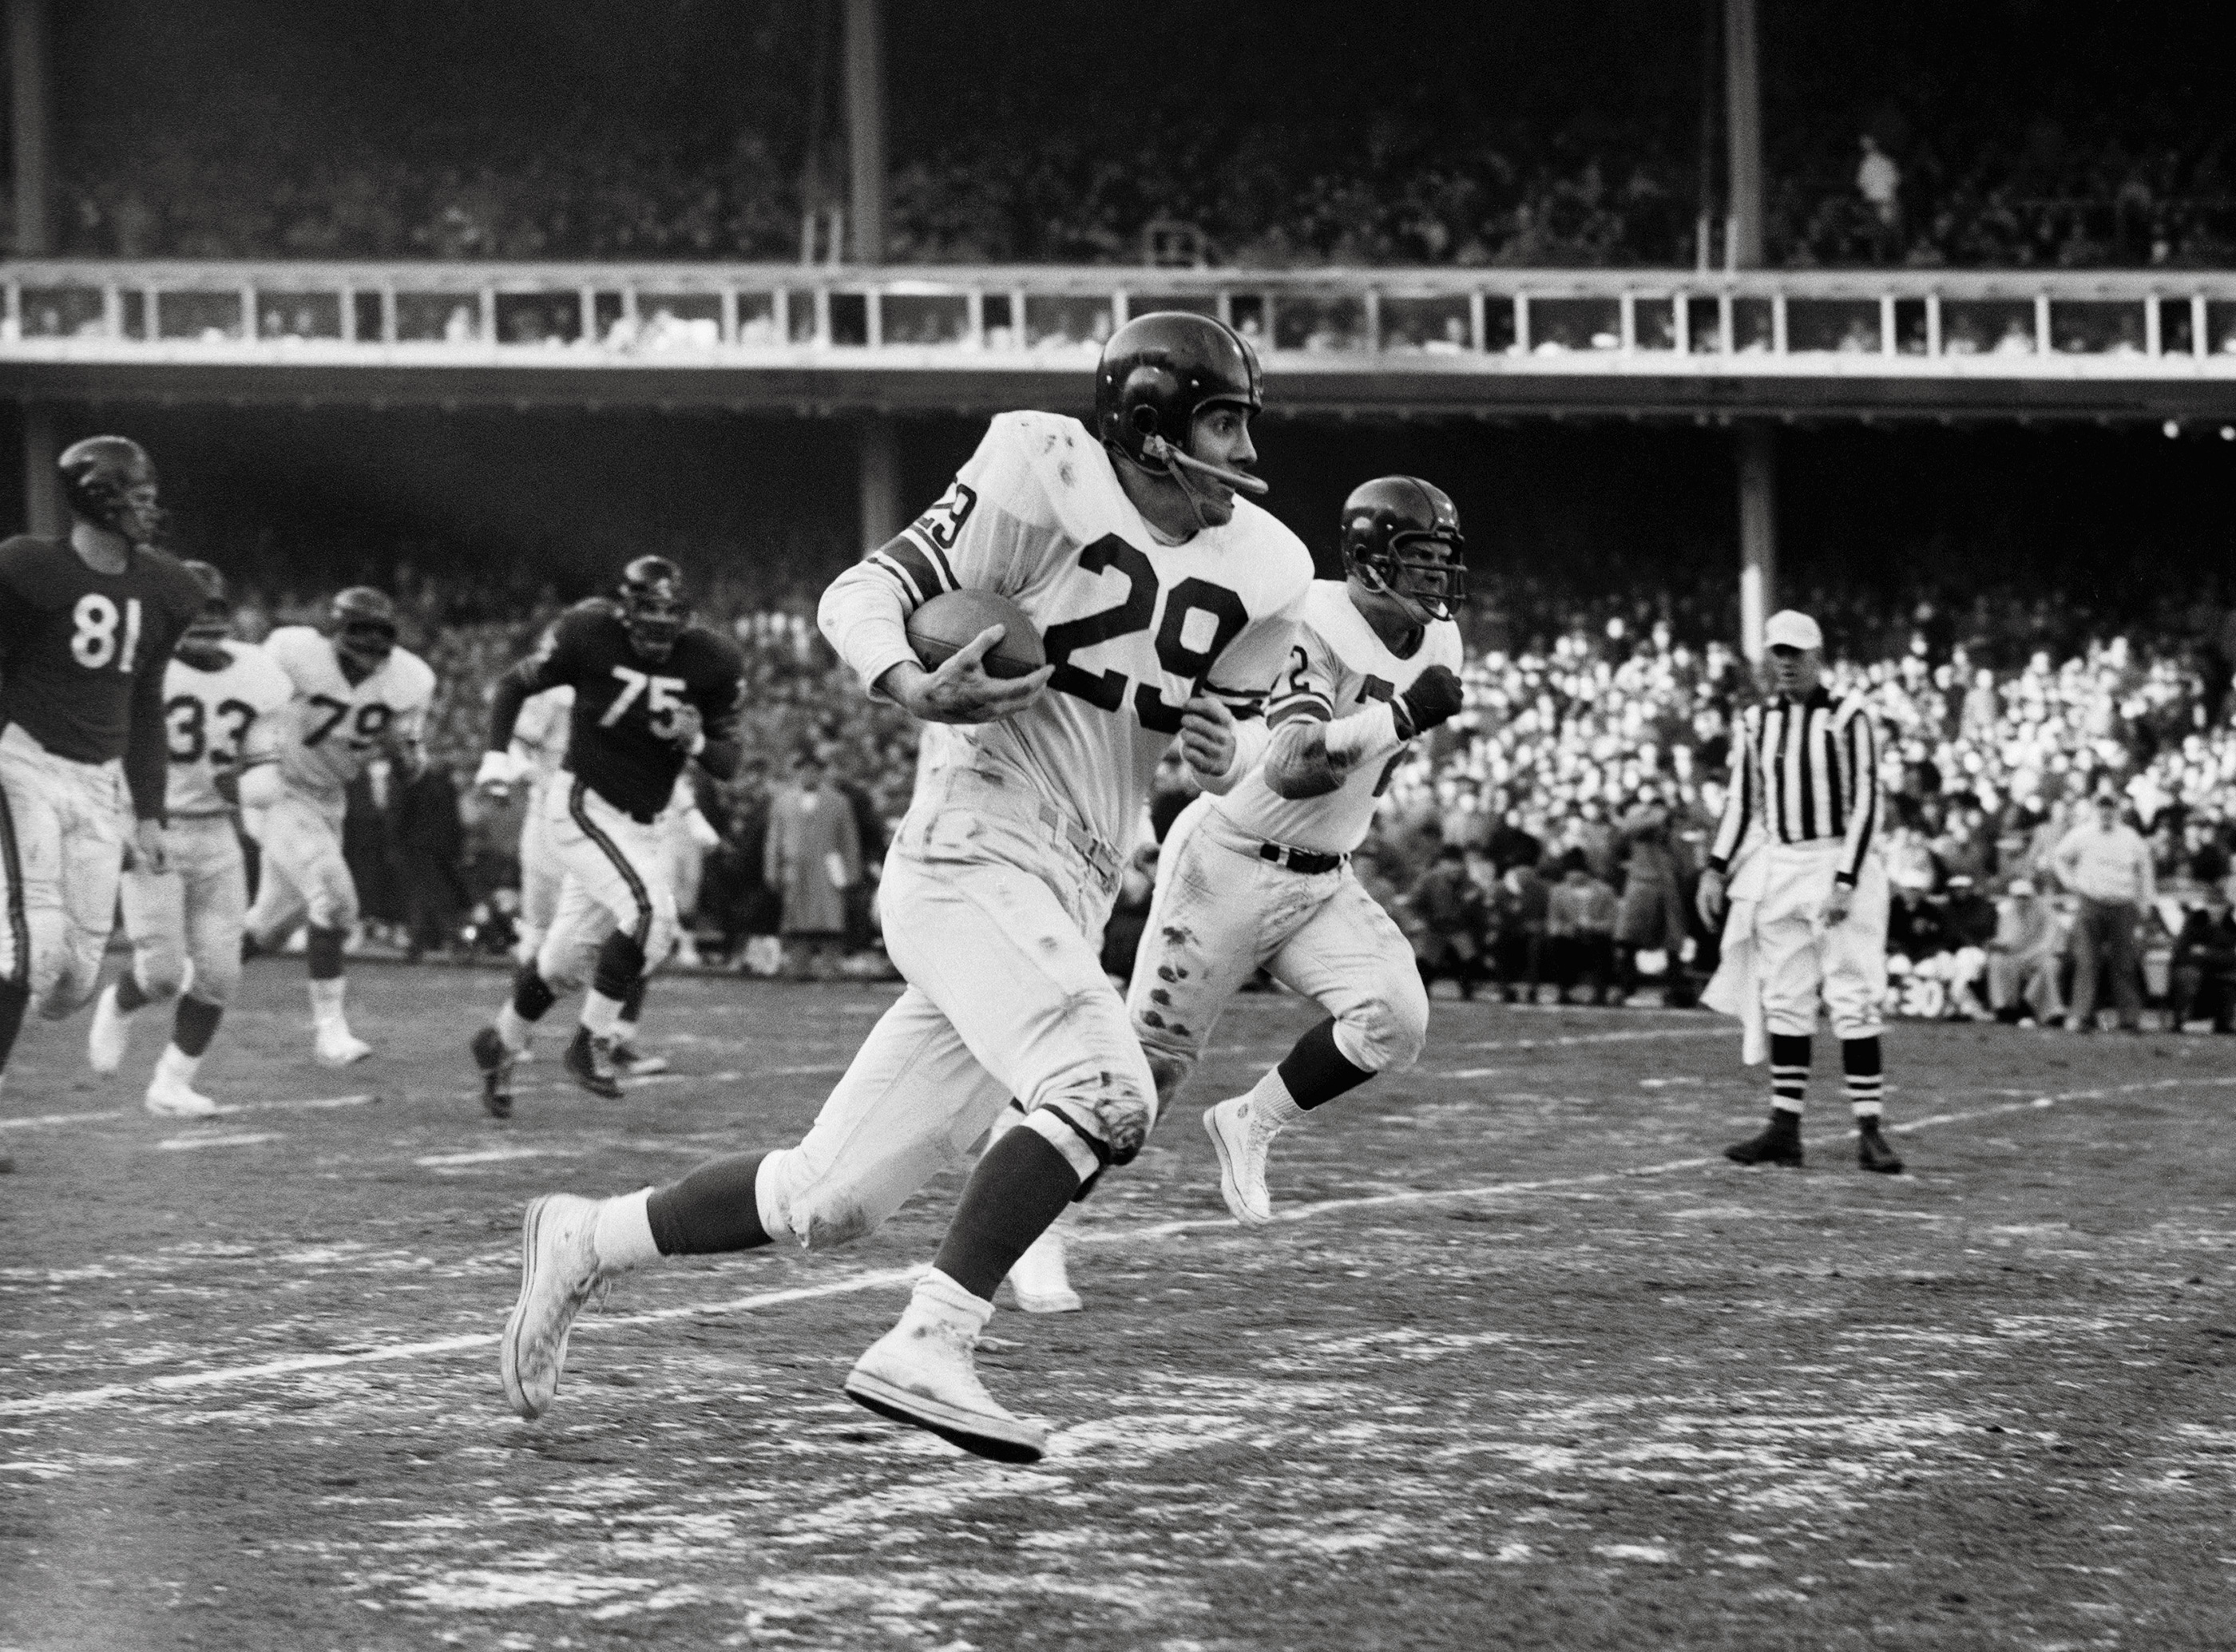 1956 Giants and Bears